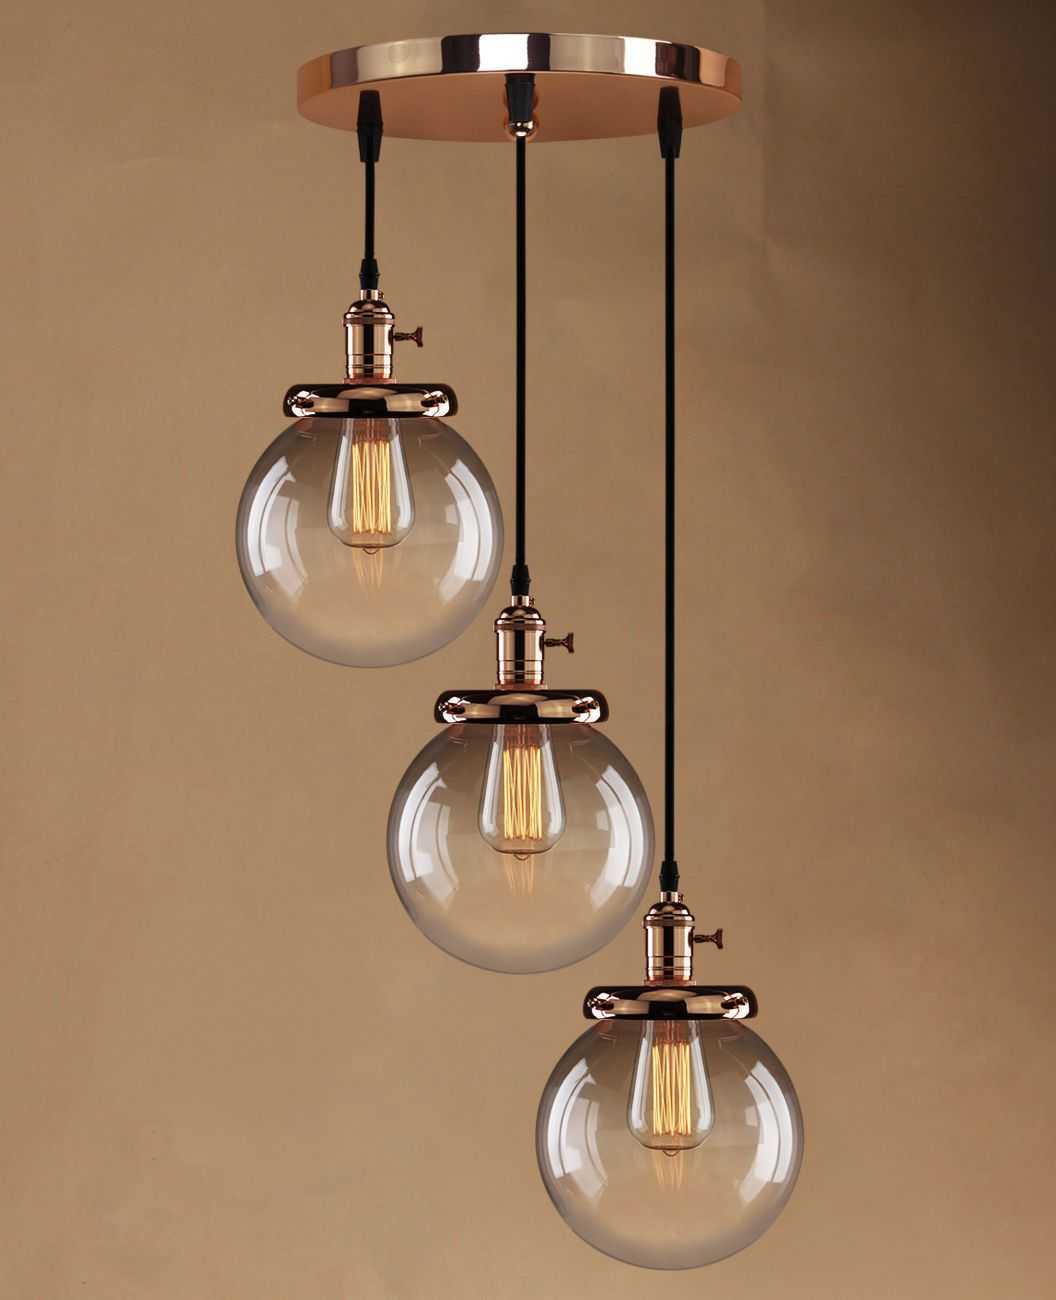 Retro Vintage Cluster Hanging Ceiling Lights Globe 3 Glass Shades Pendant Lamp